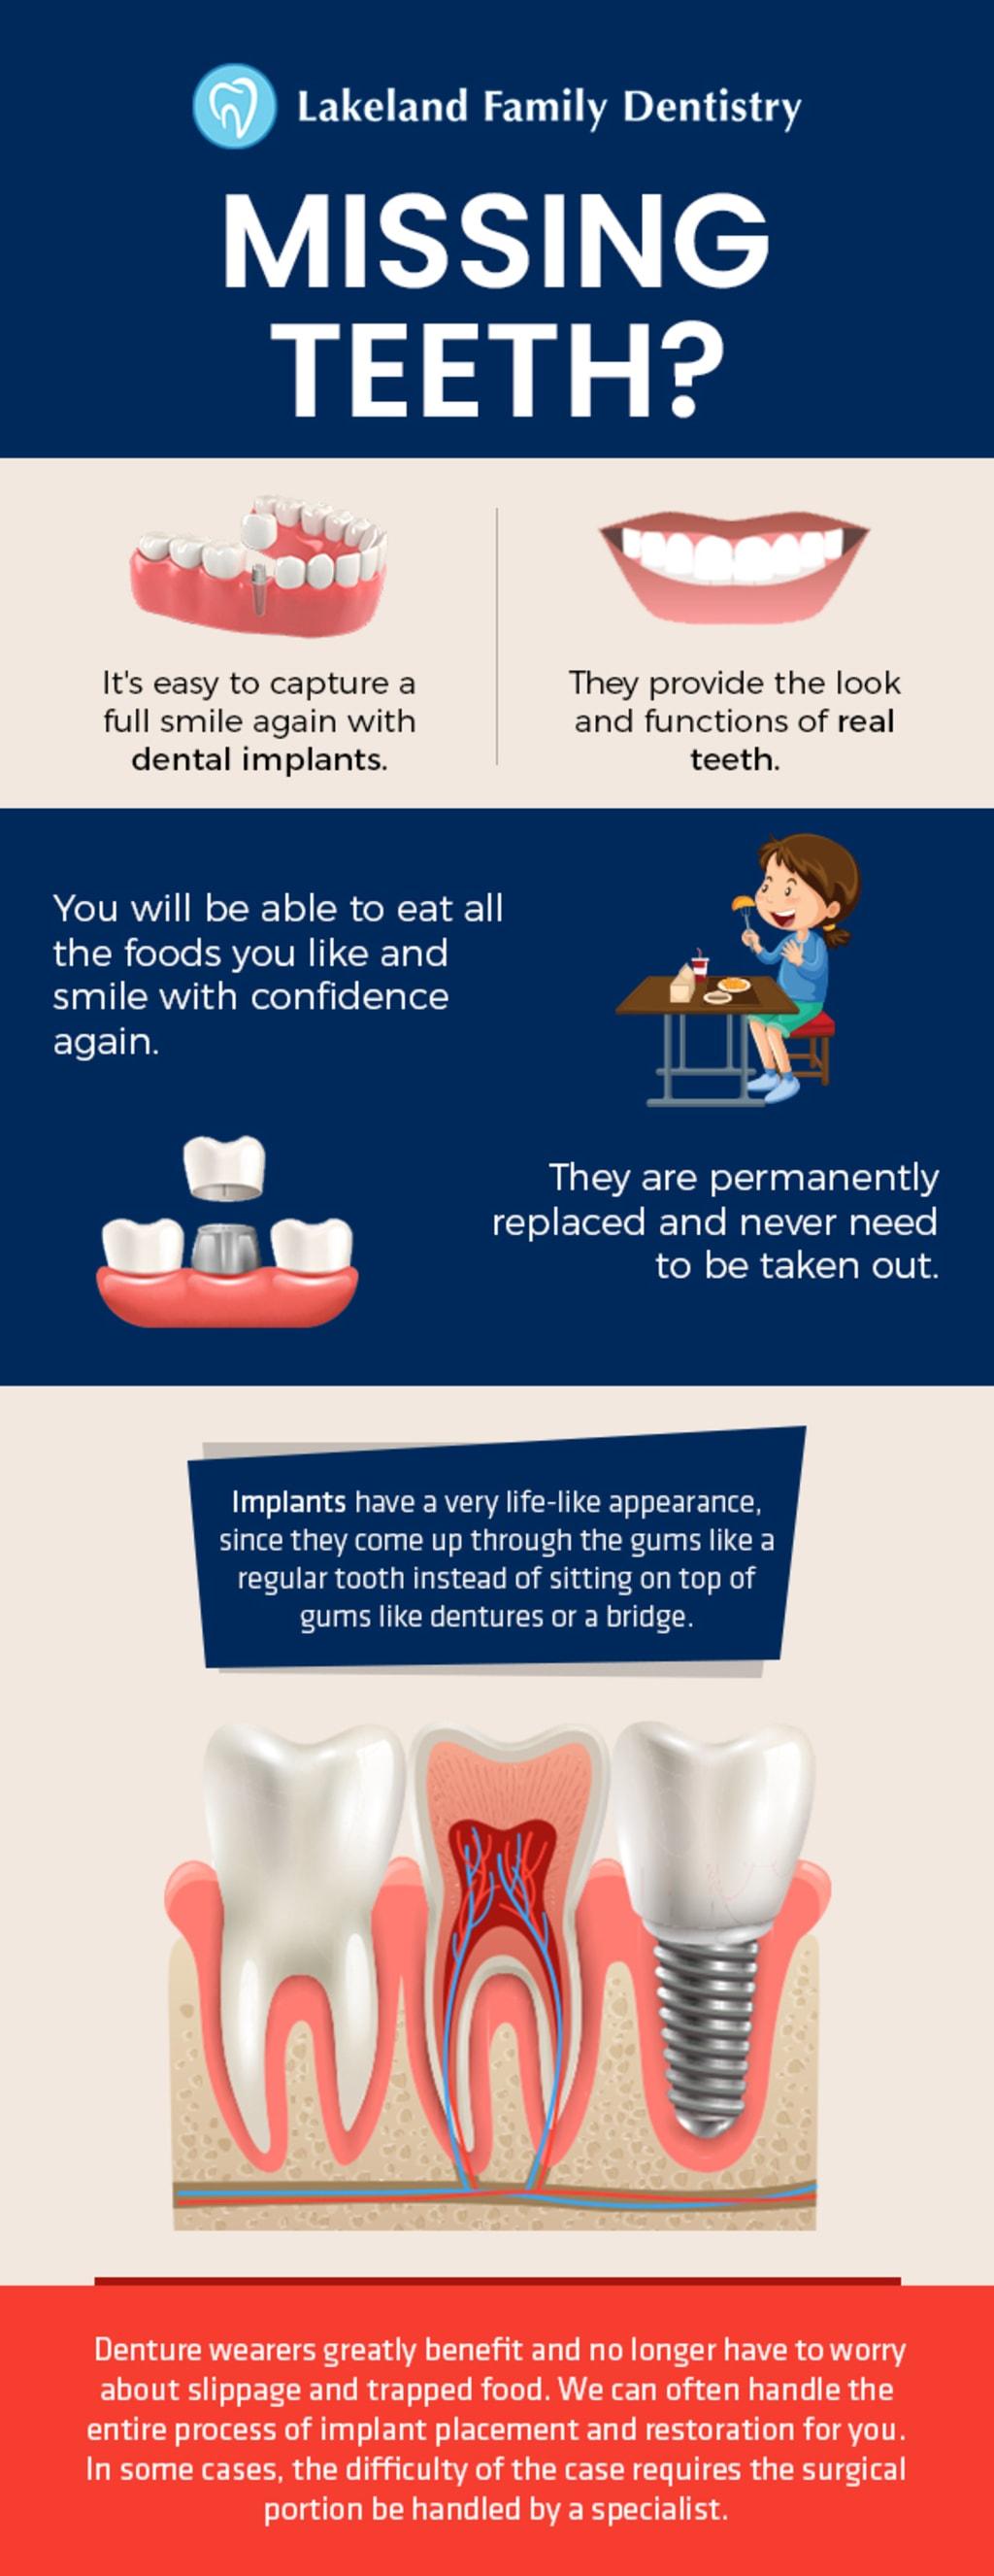 Dental Implants by Lakeland Family Dentistry - Natural Looki... via Lakeland Family Dentistry